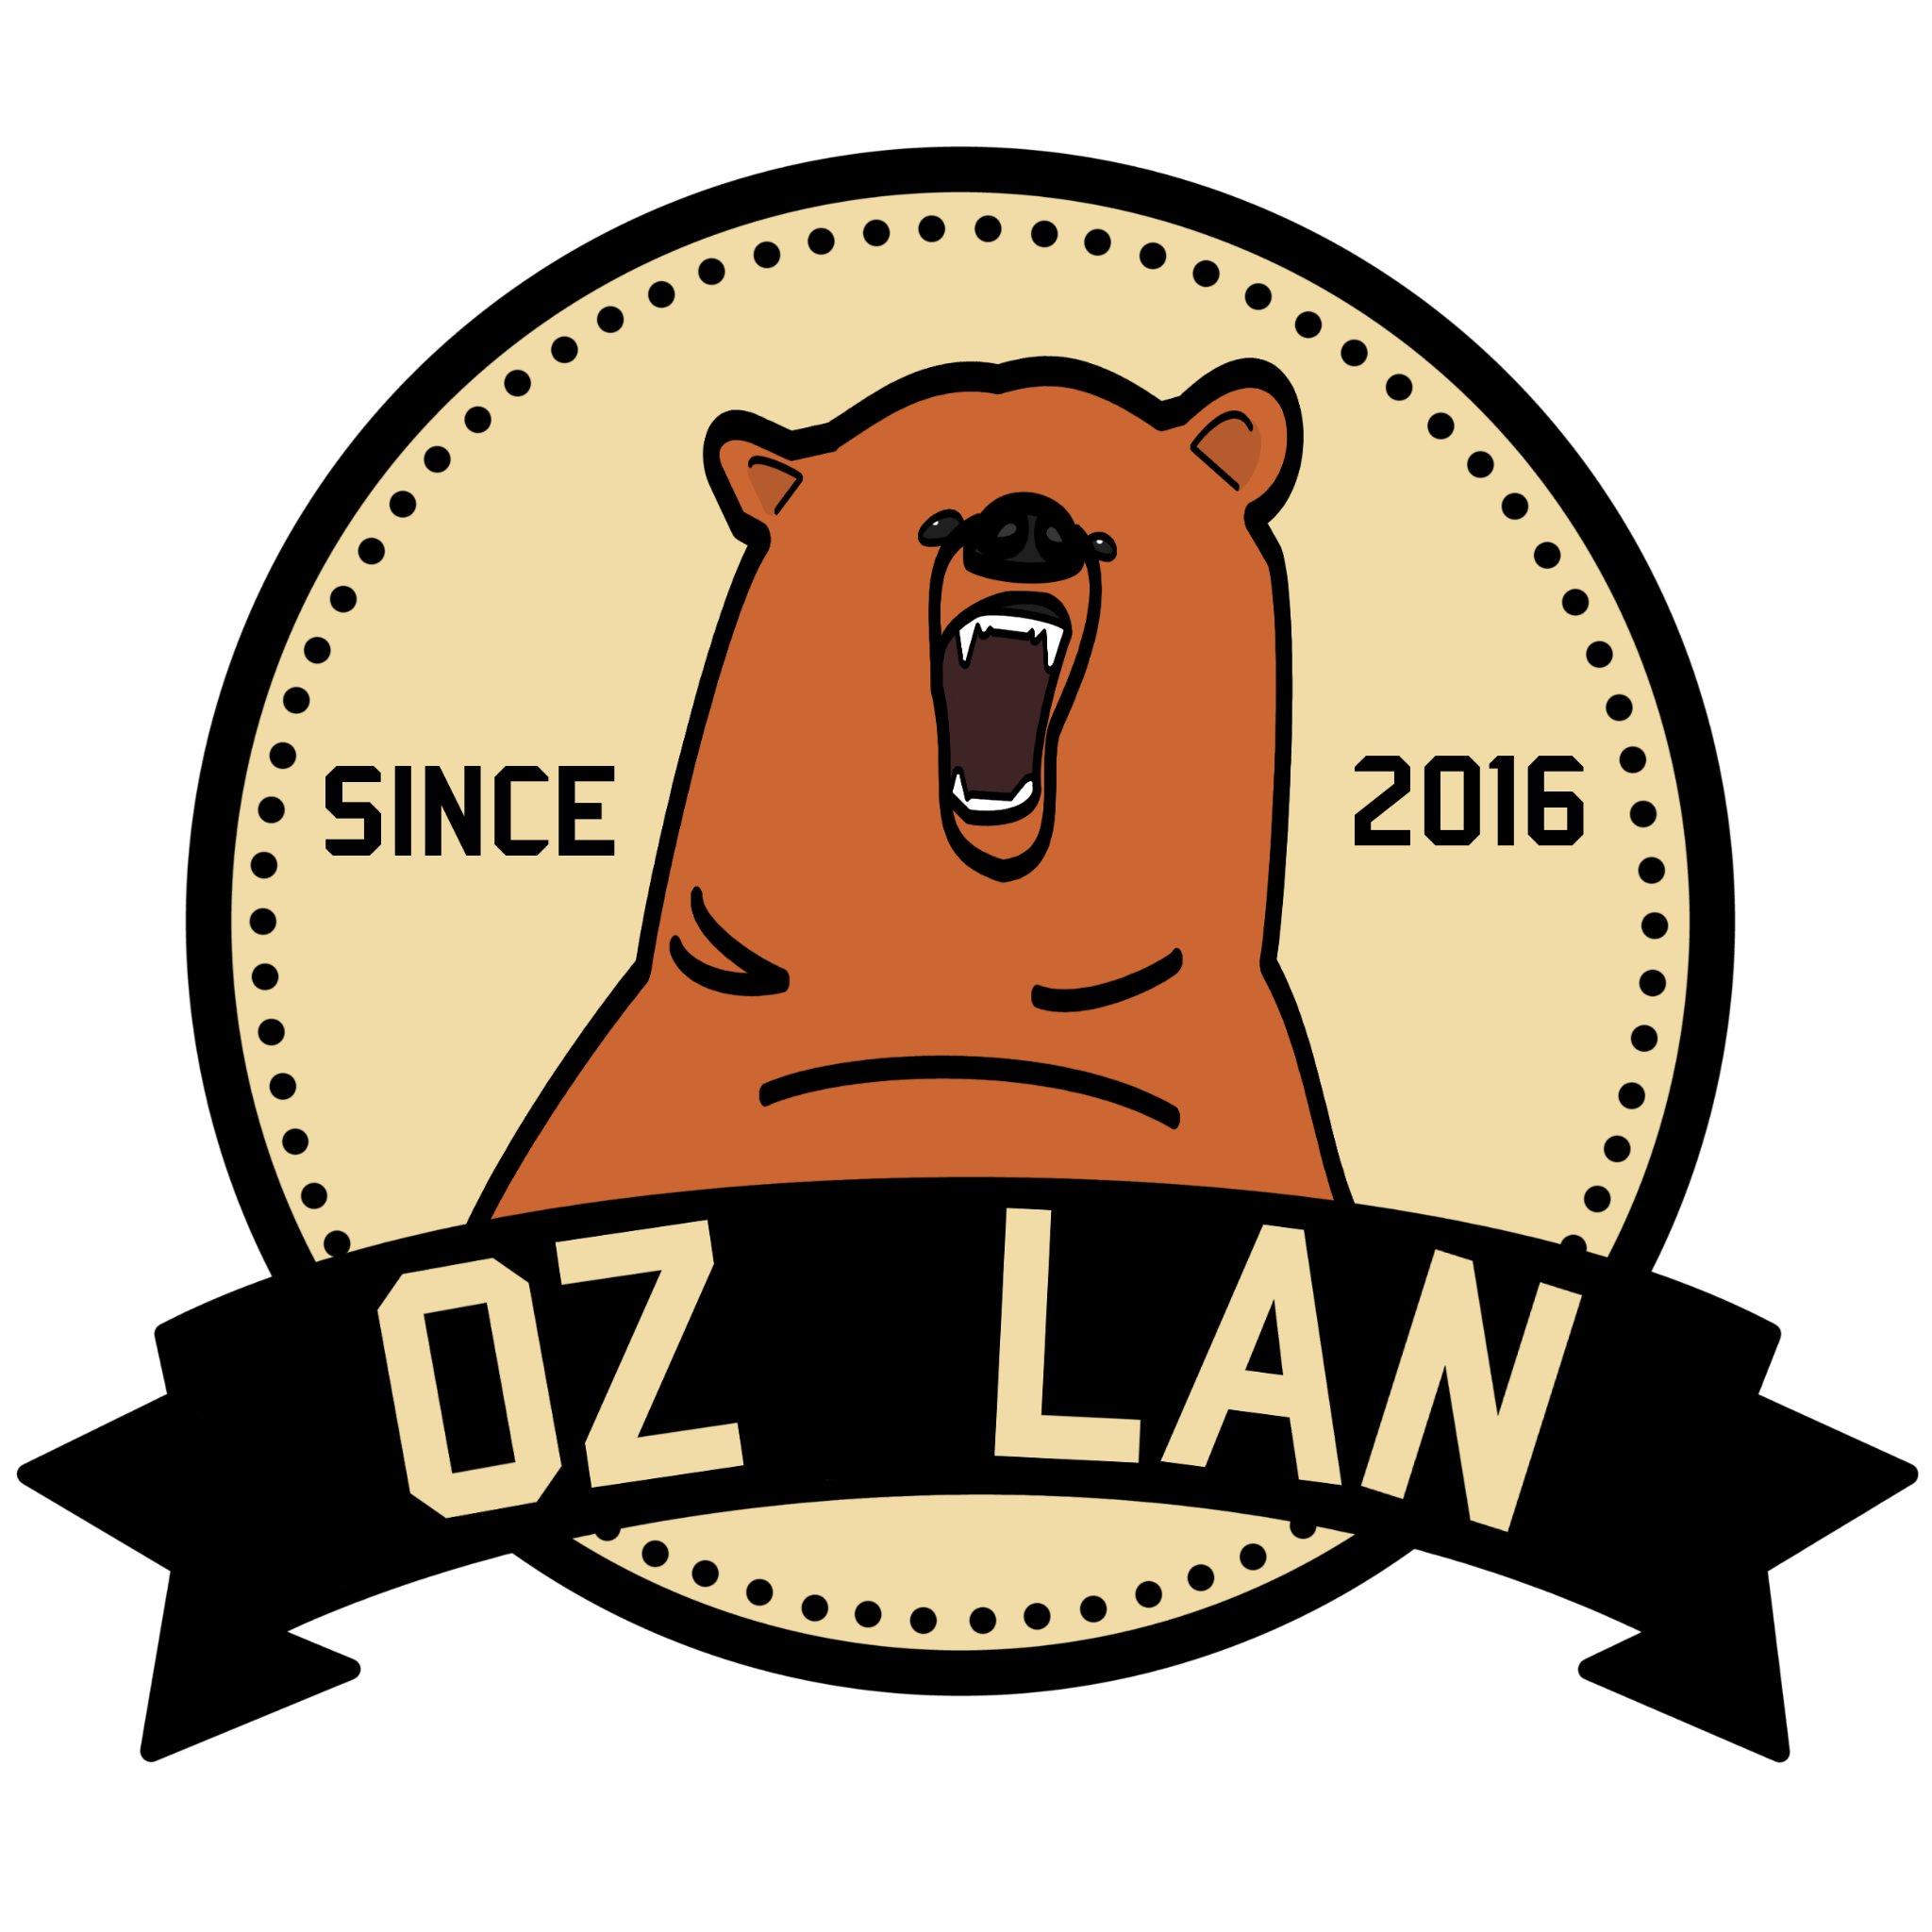 OzLAN